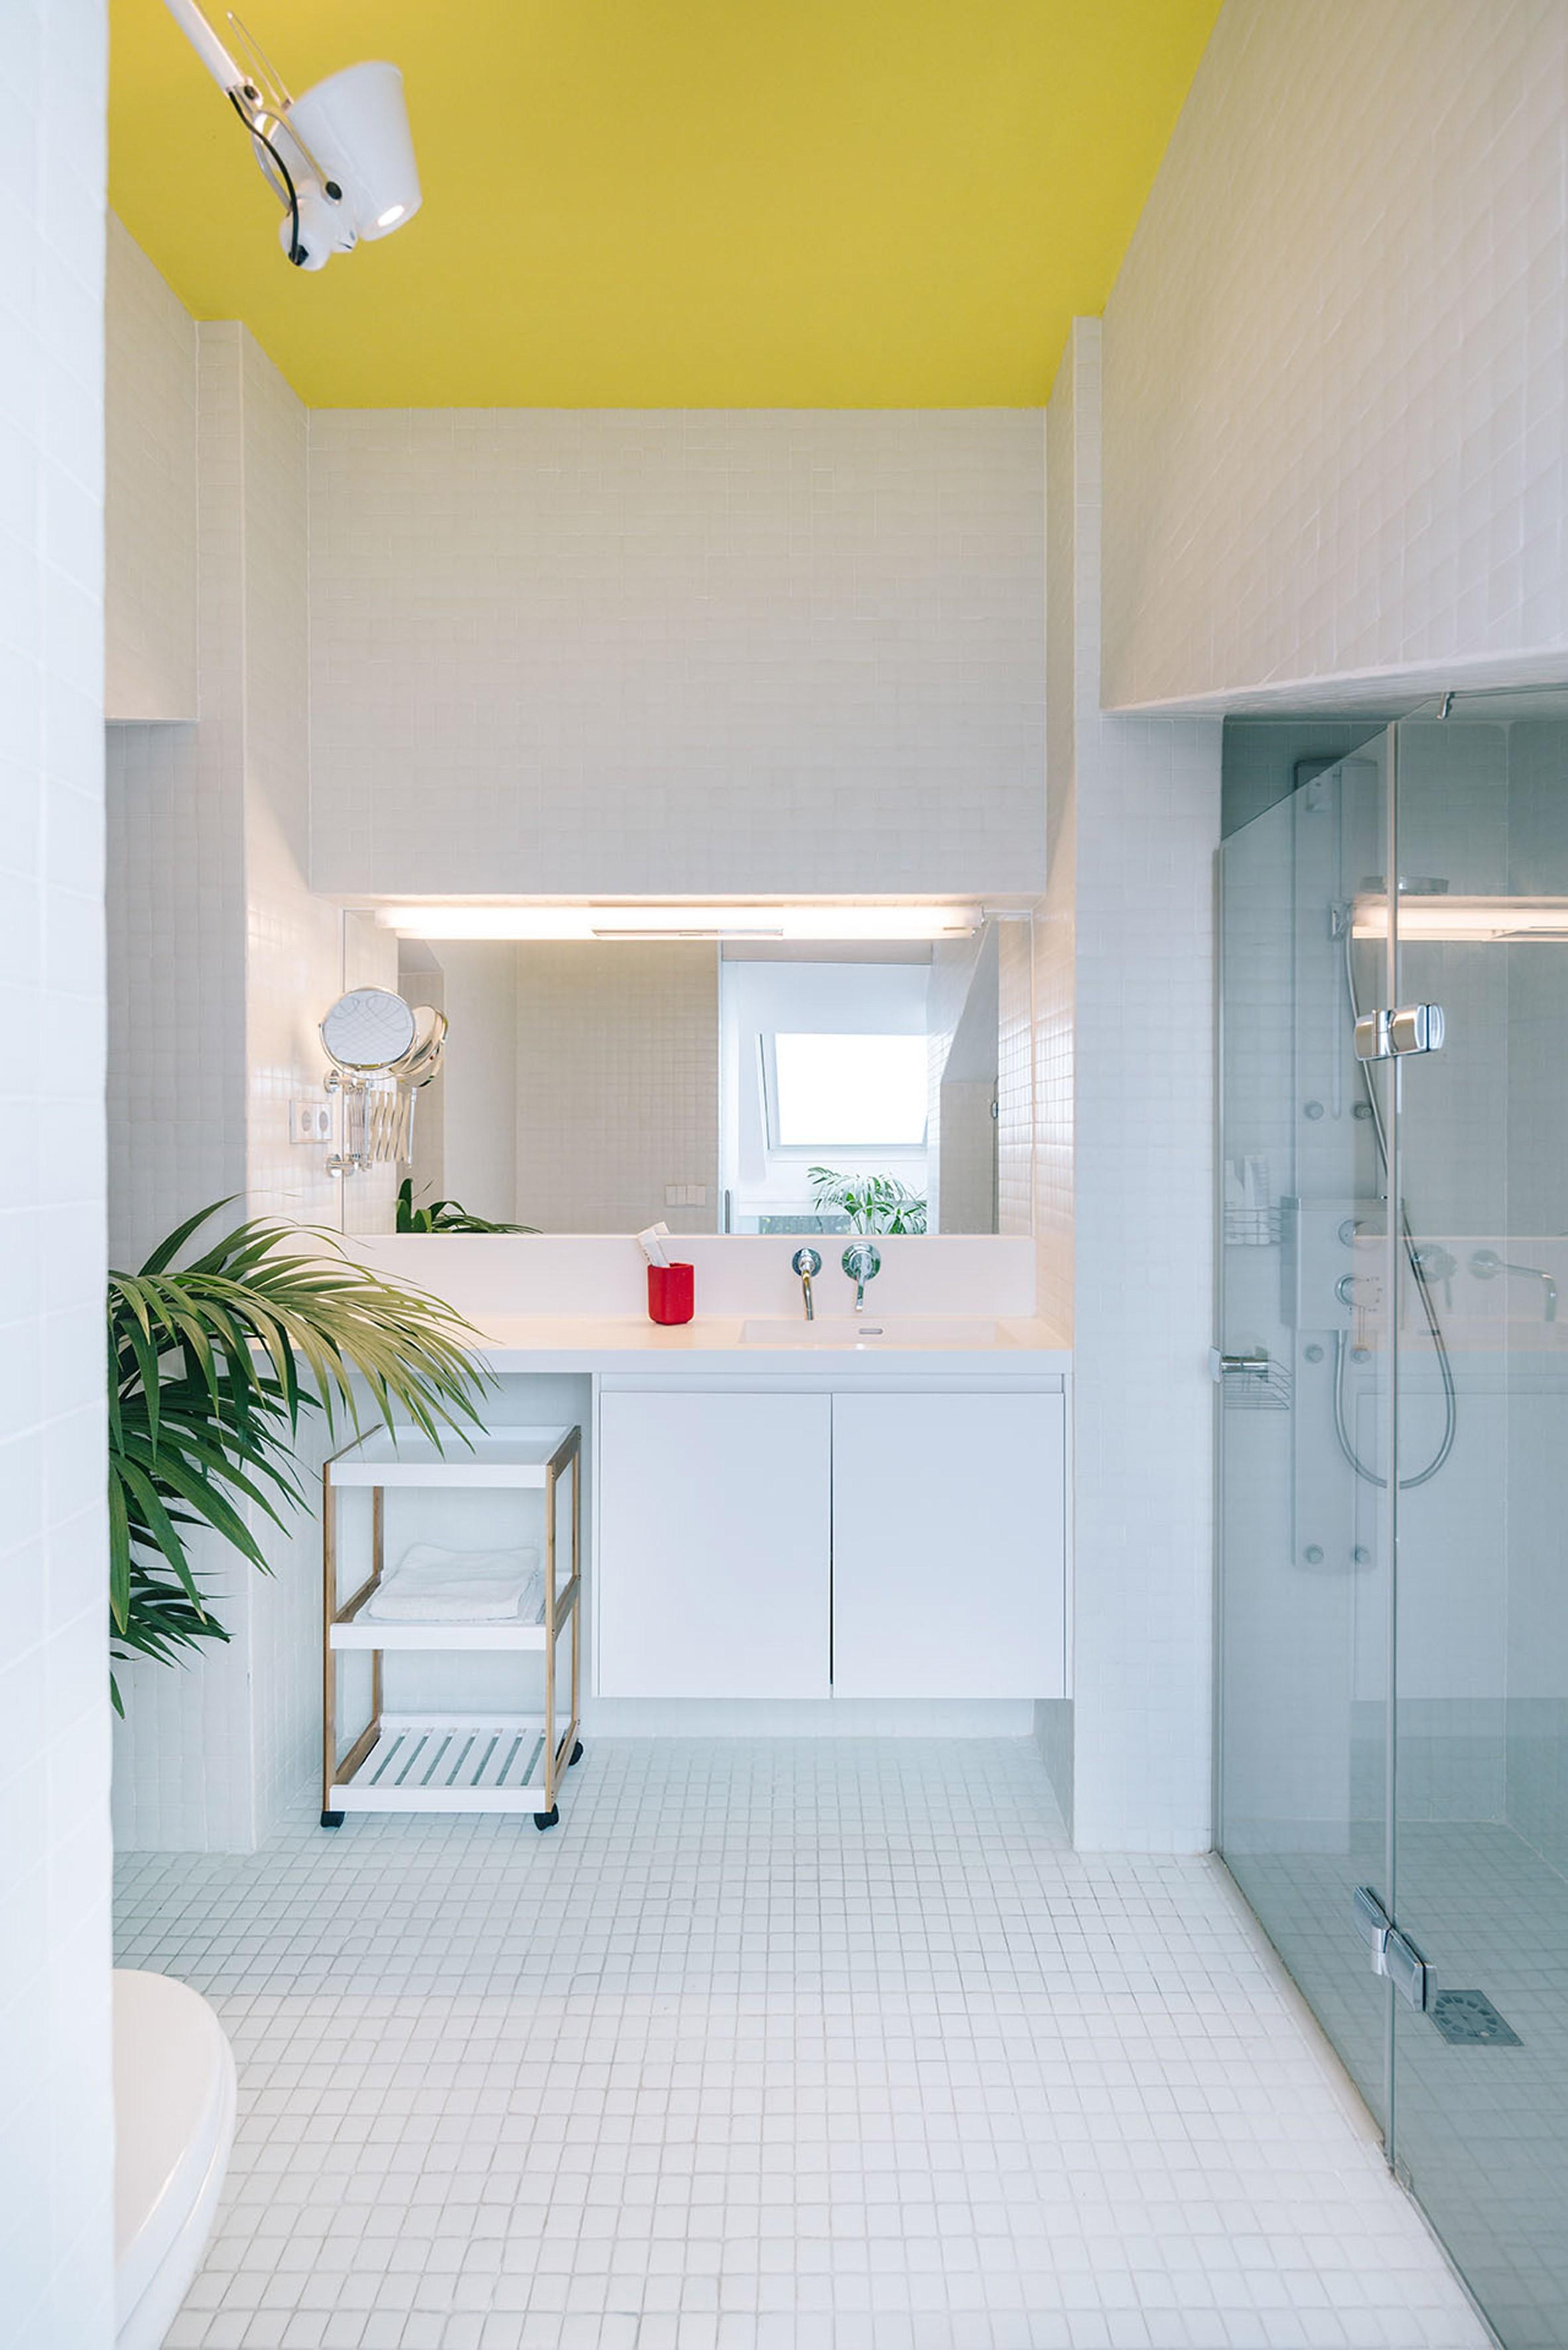 g-house-gon-architects-interiors-dezeen-2364-col-33-k51rq.jpg